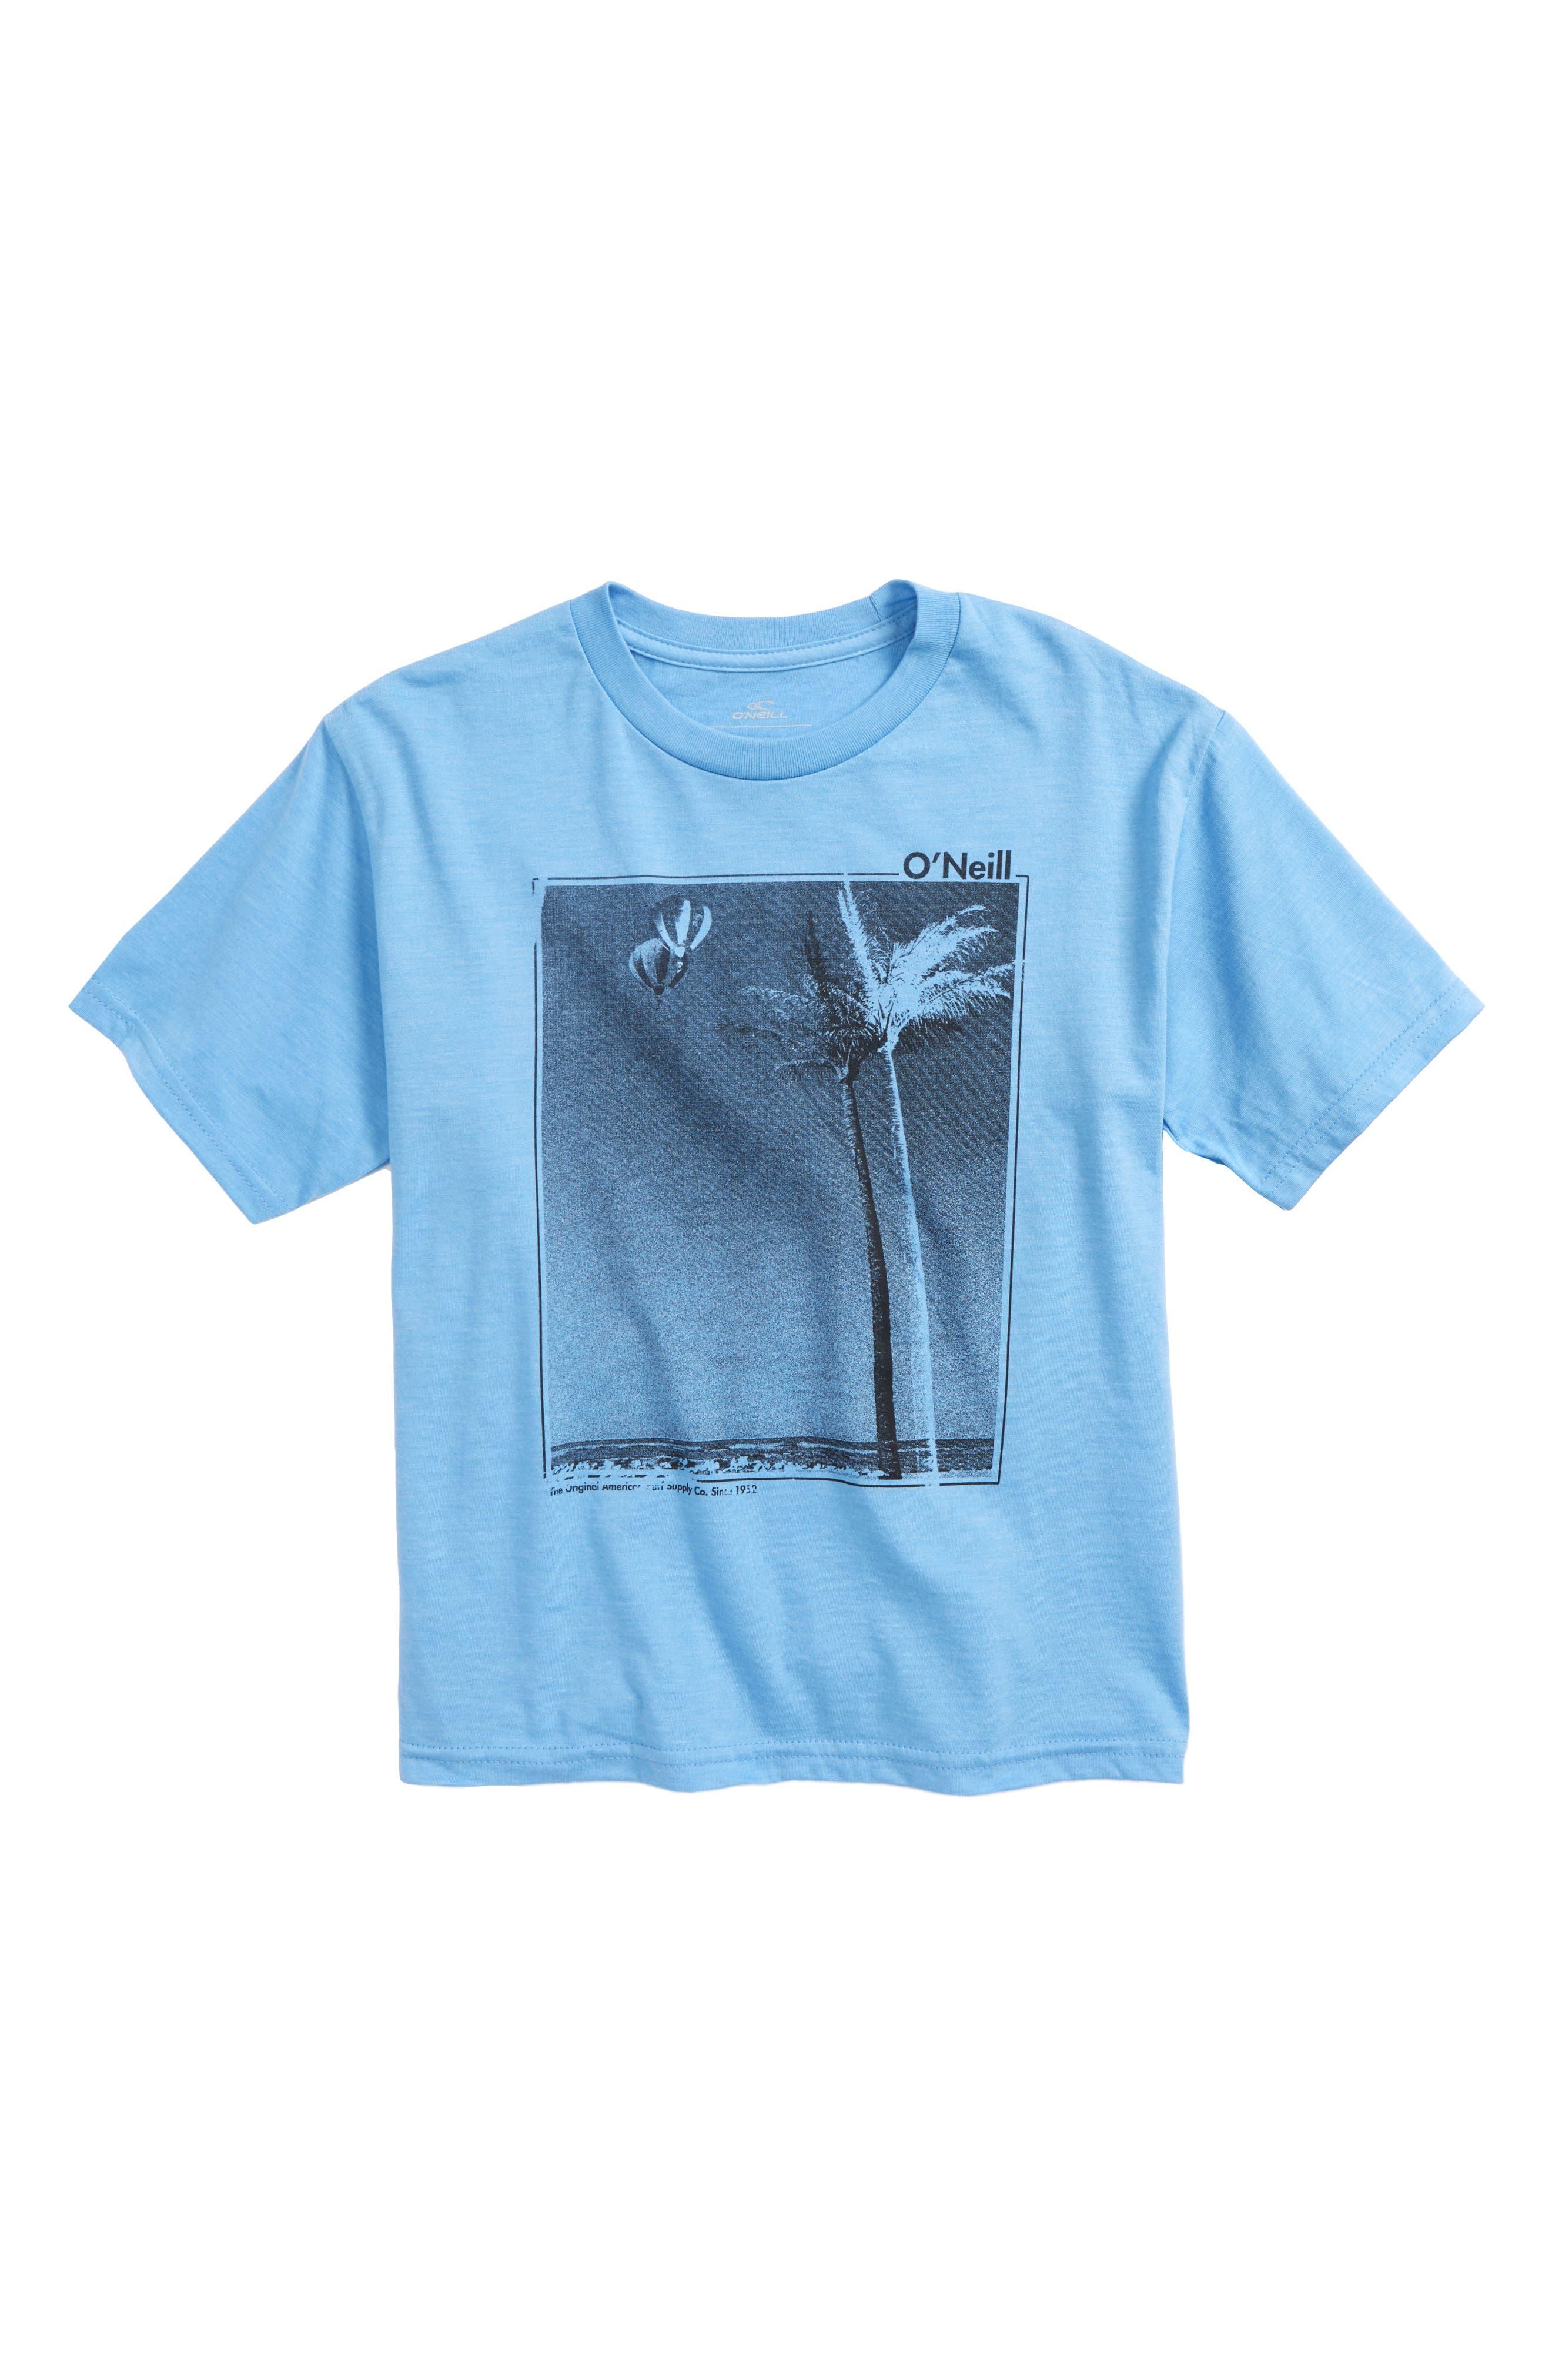 Treez T-Shirt,                             Main thumbnail 1, color,                             Light Blue Heather